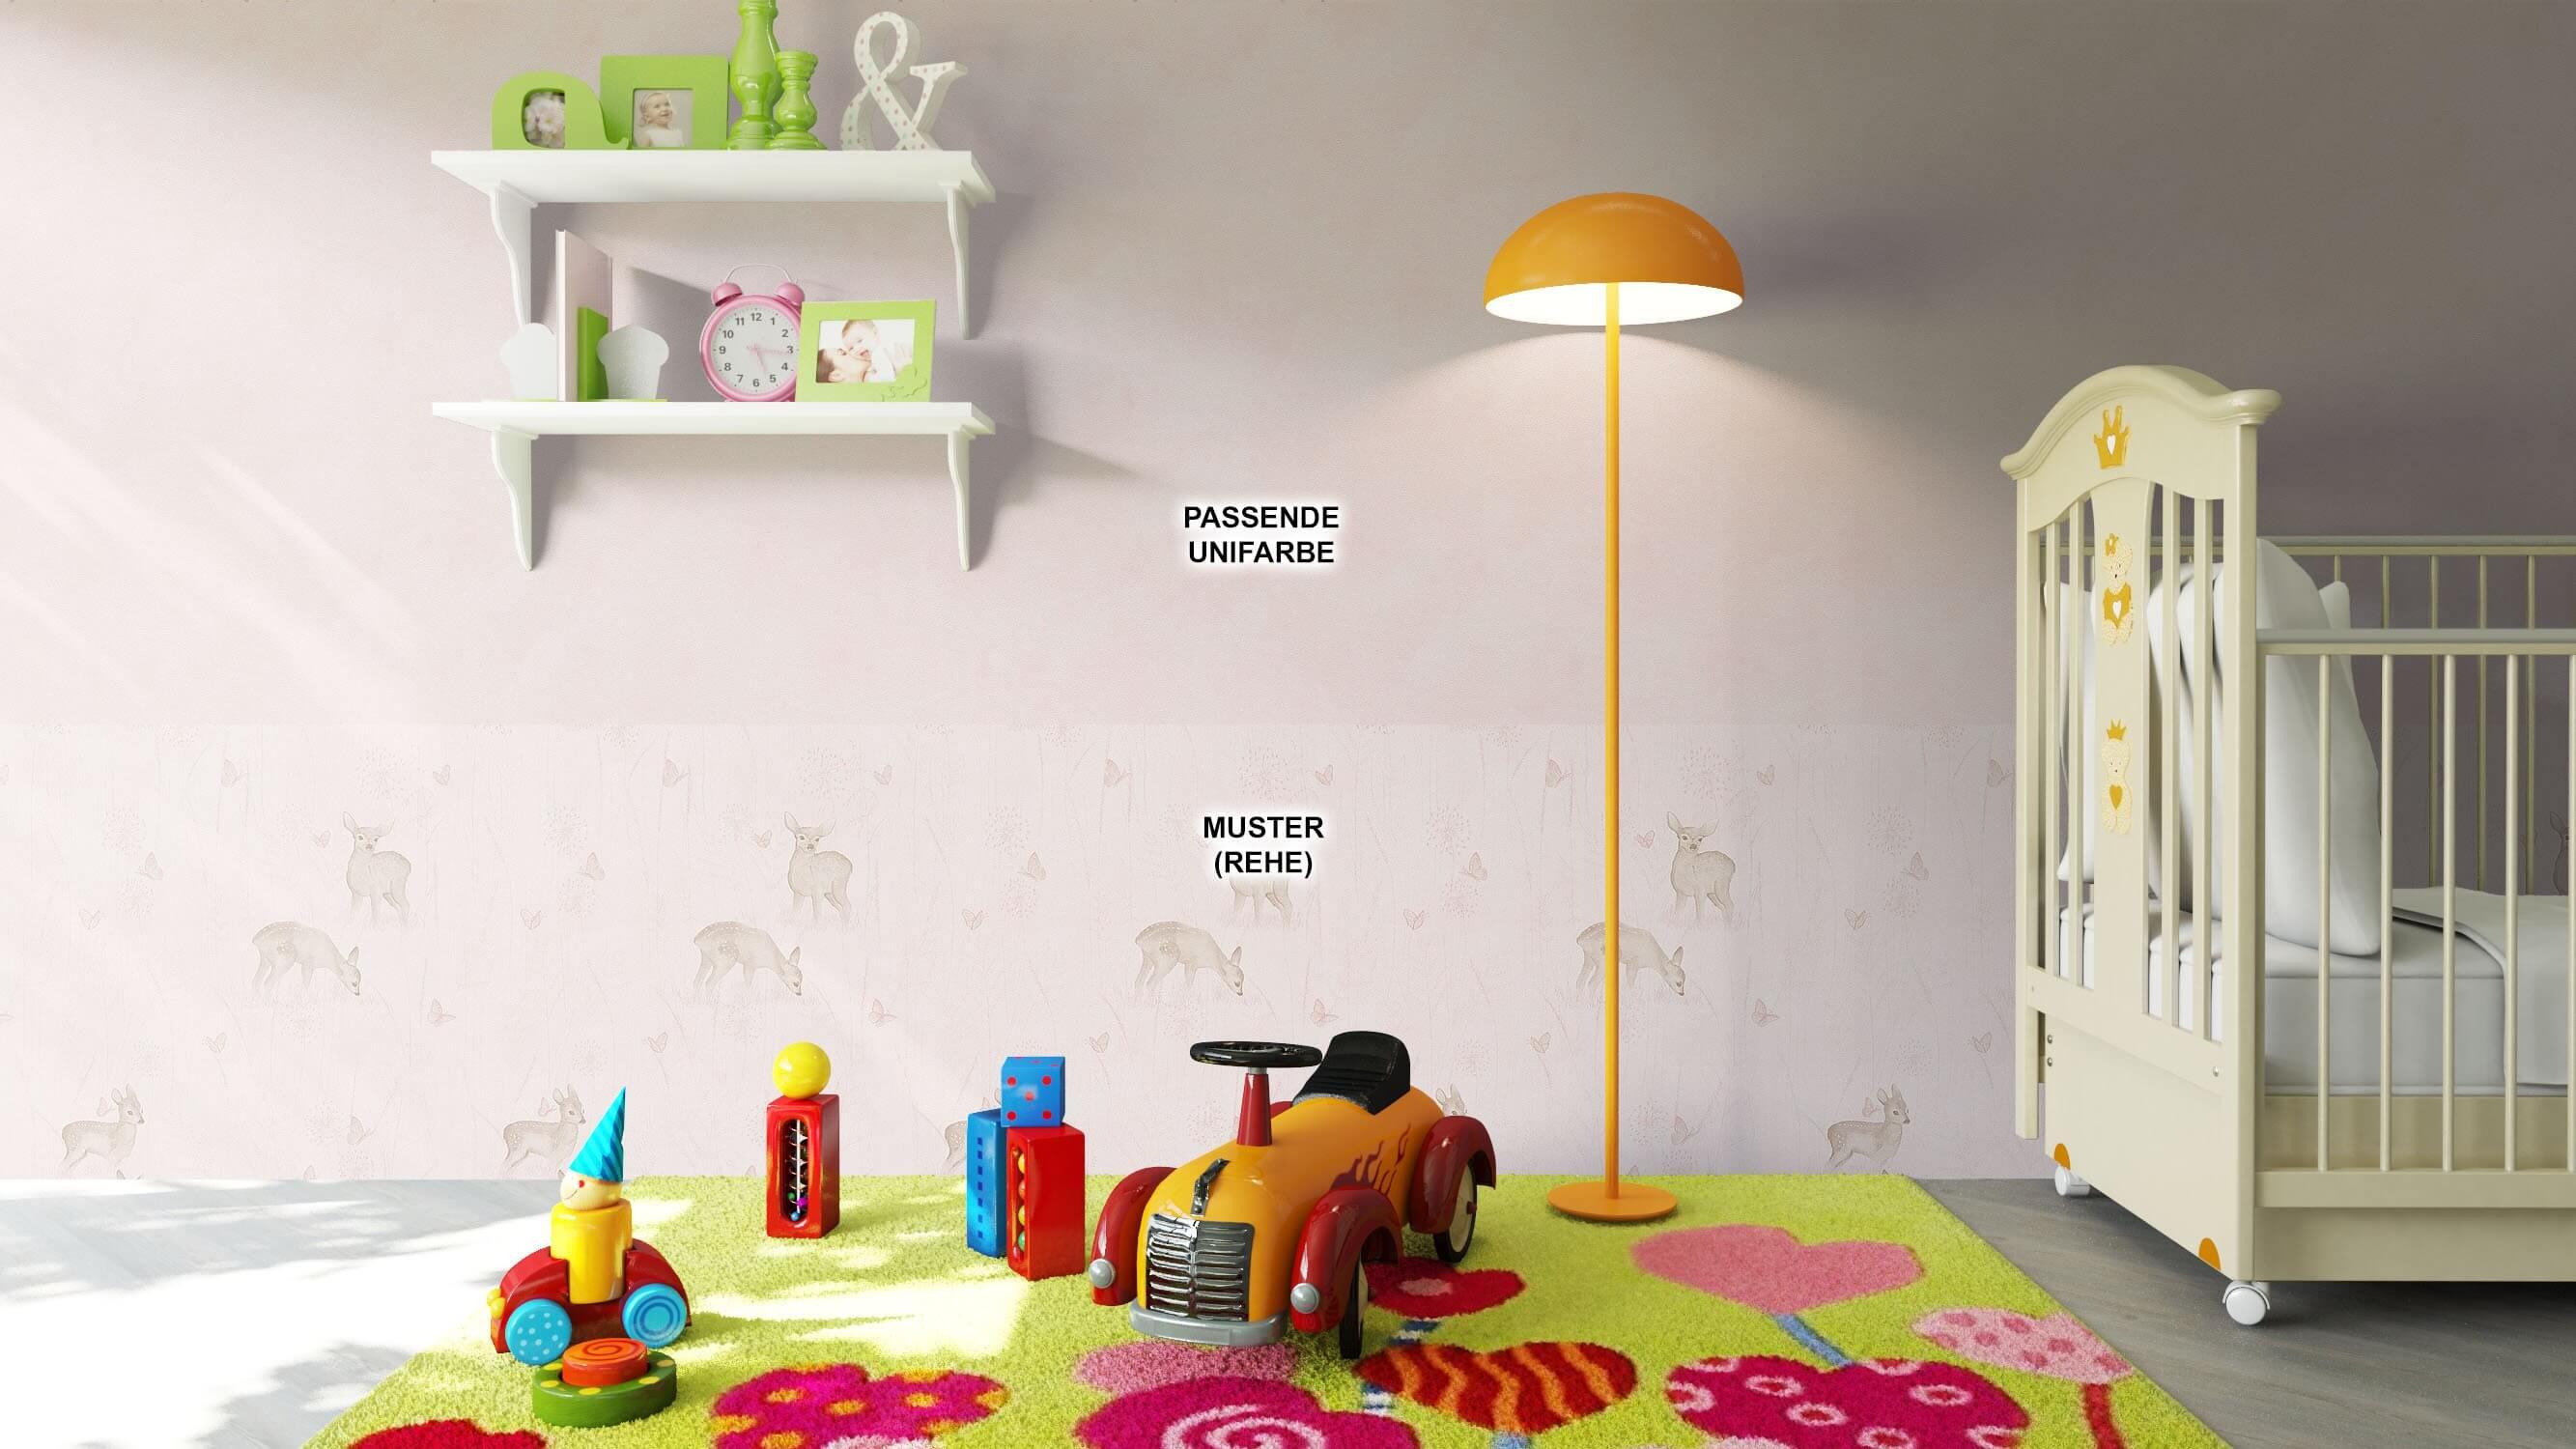 ... Tapete Kinder Kinderzimmer Rosa Creme Braun Deko ...